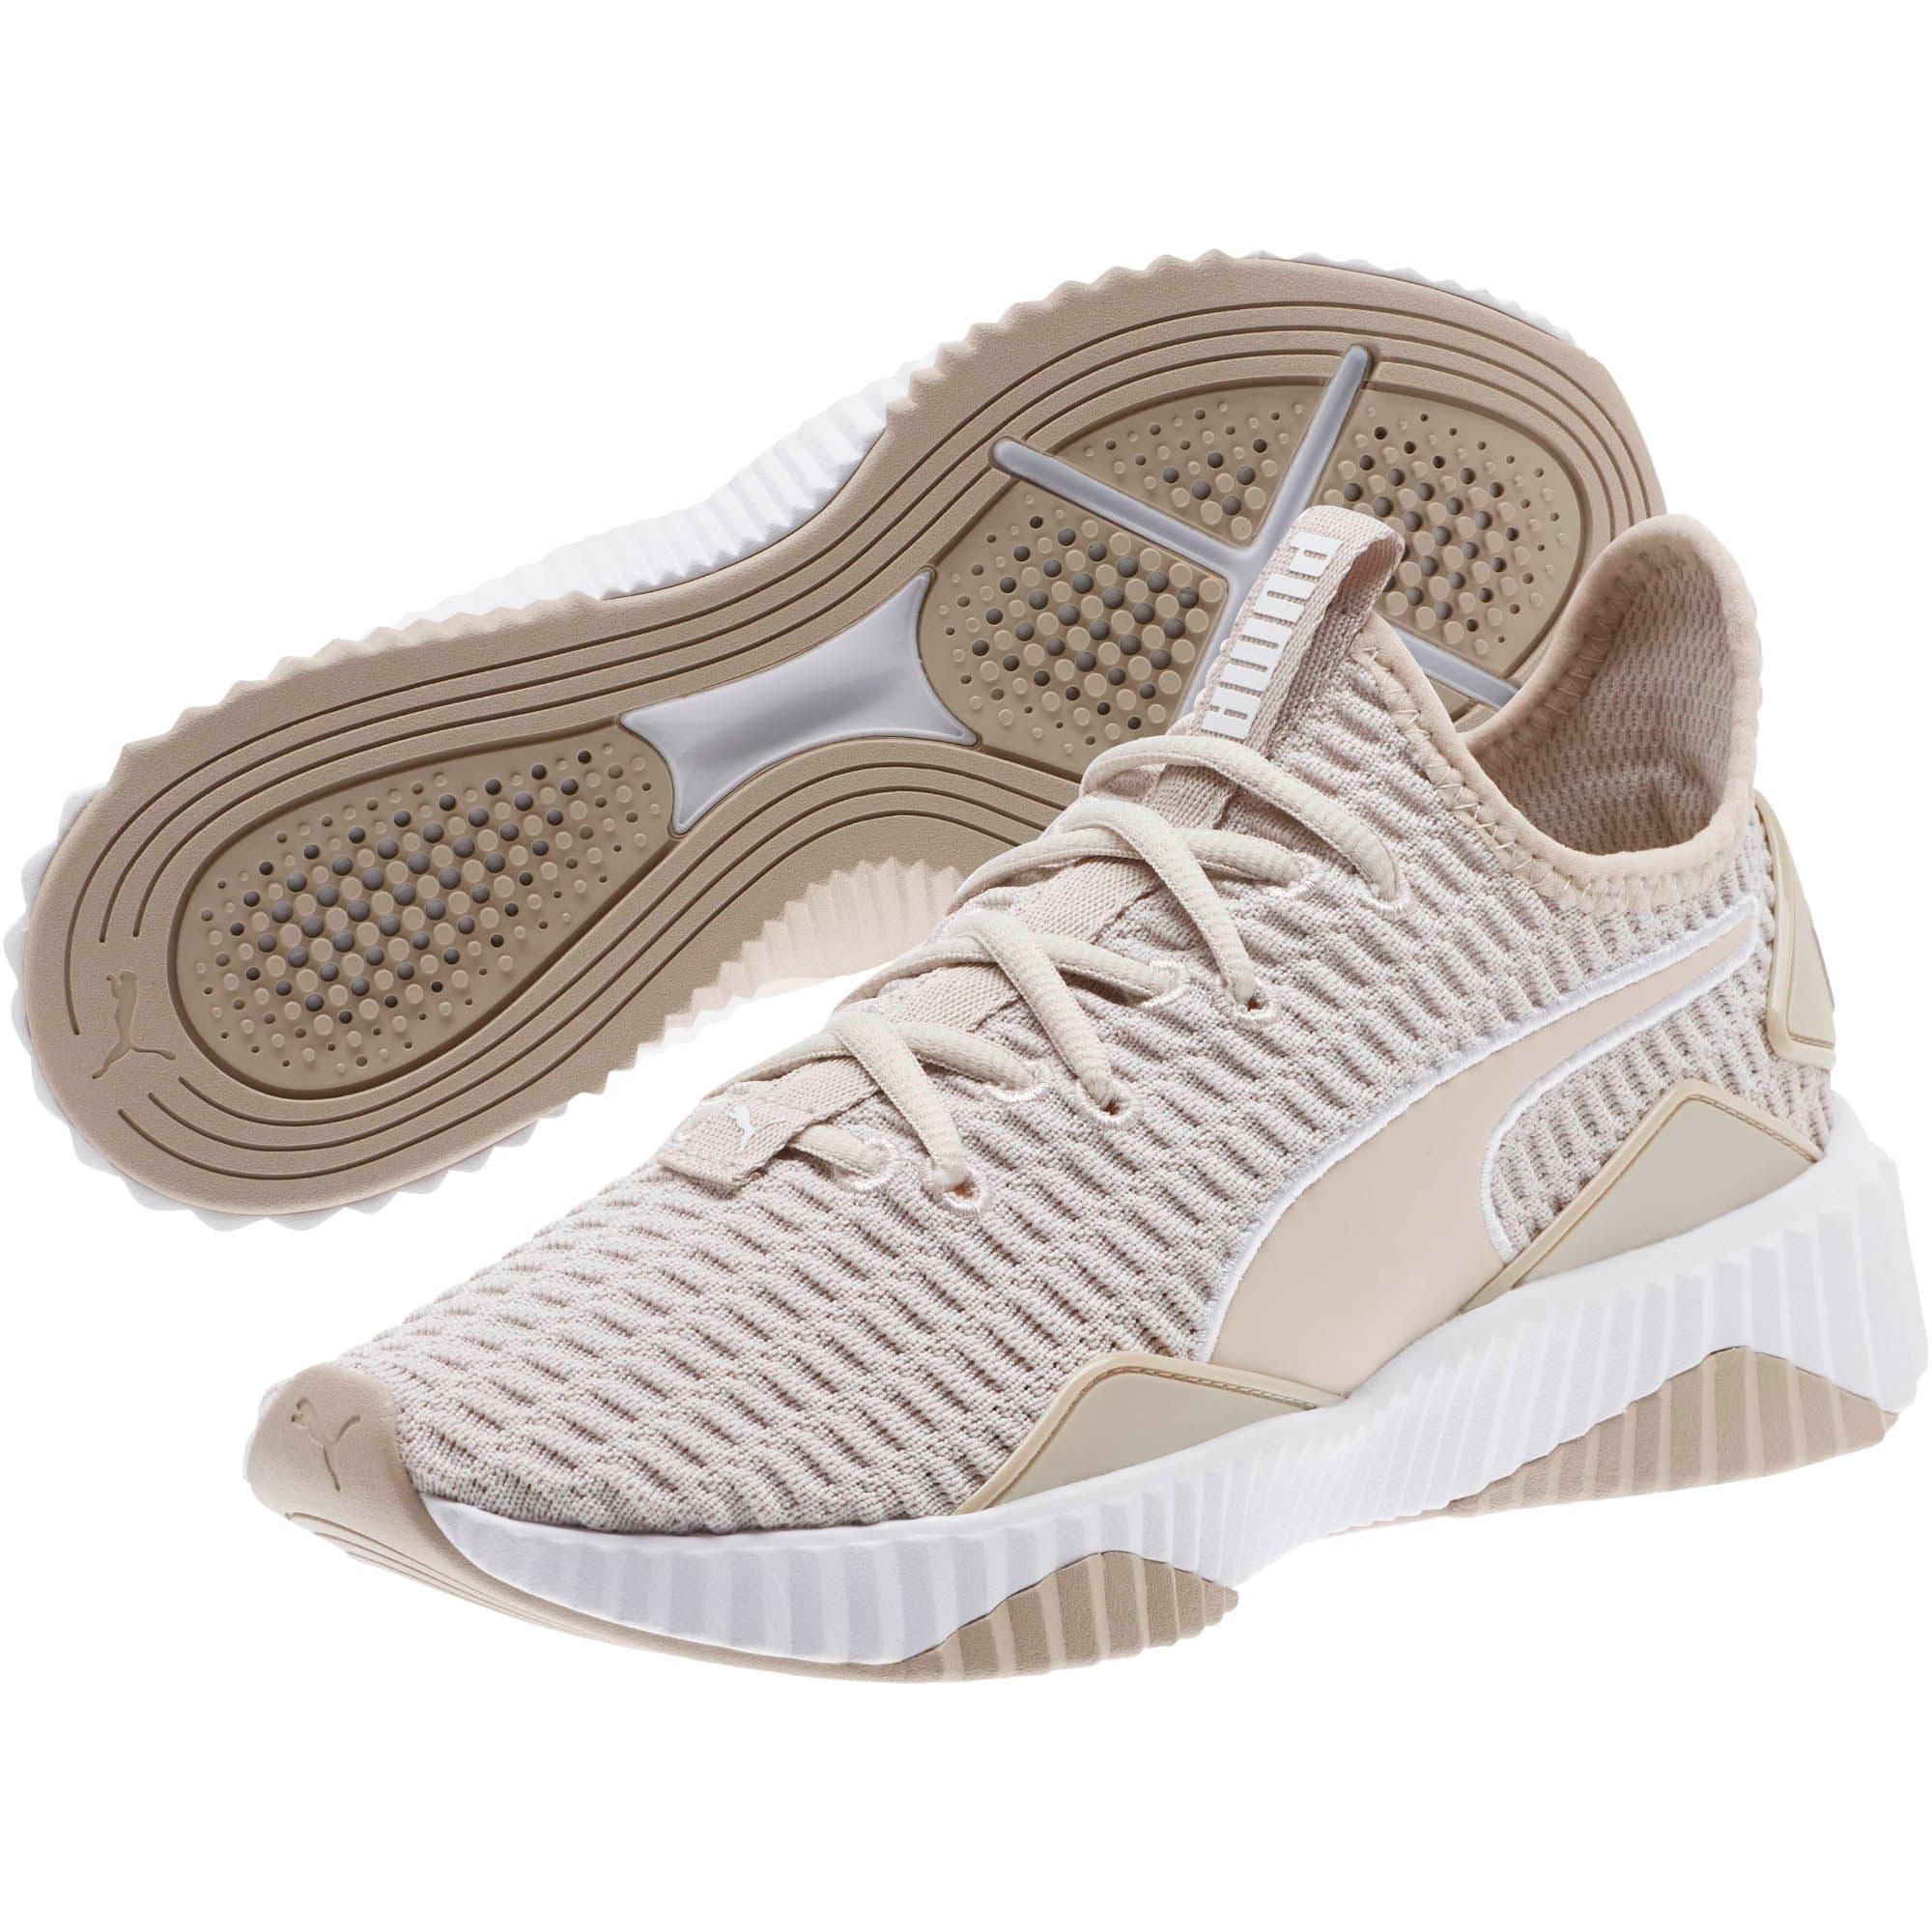 Thumbnail 2 of Defy Women's Training Shoes, Silver Gray-Puma White, medium